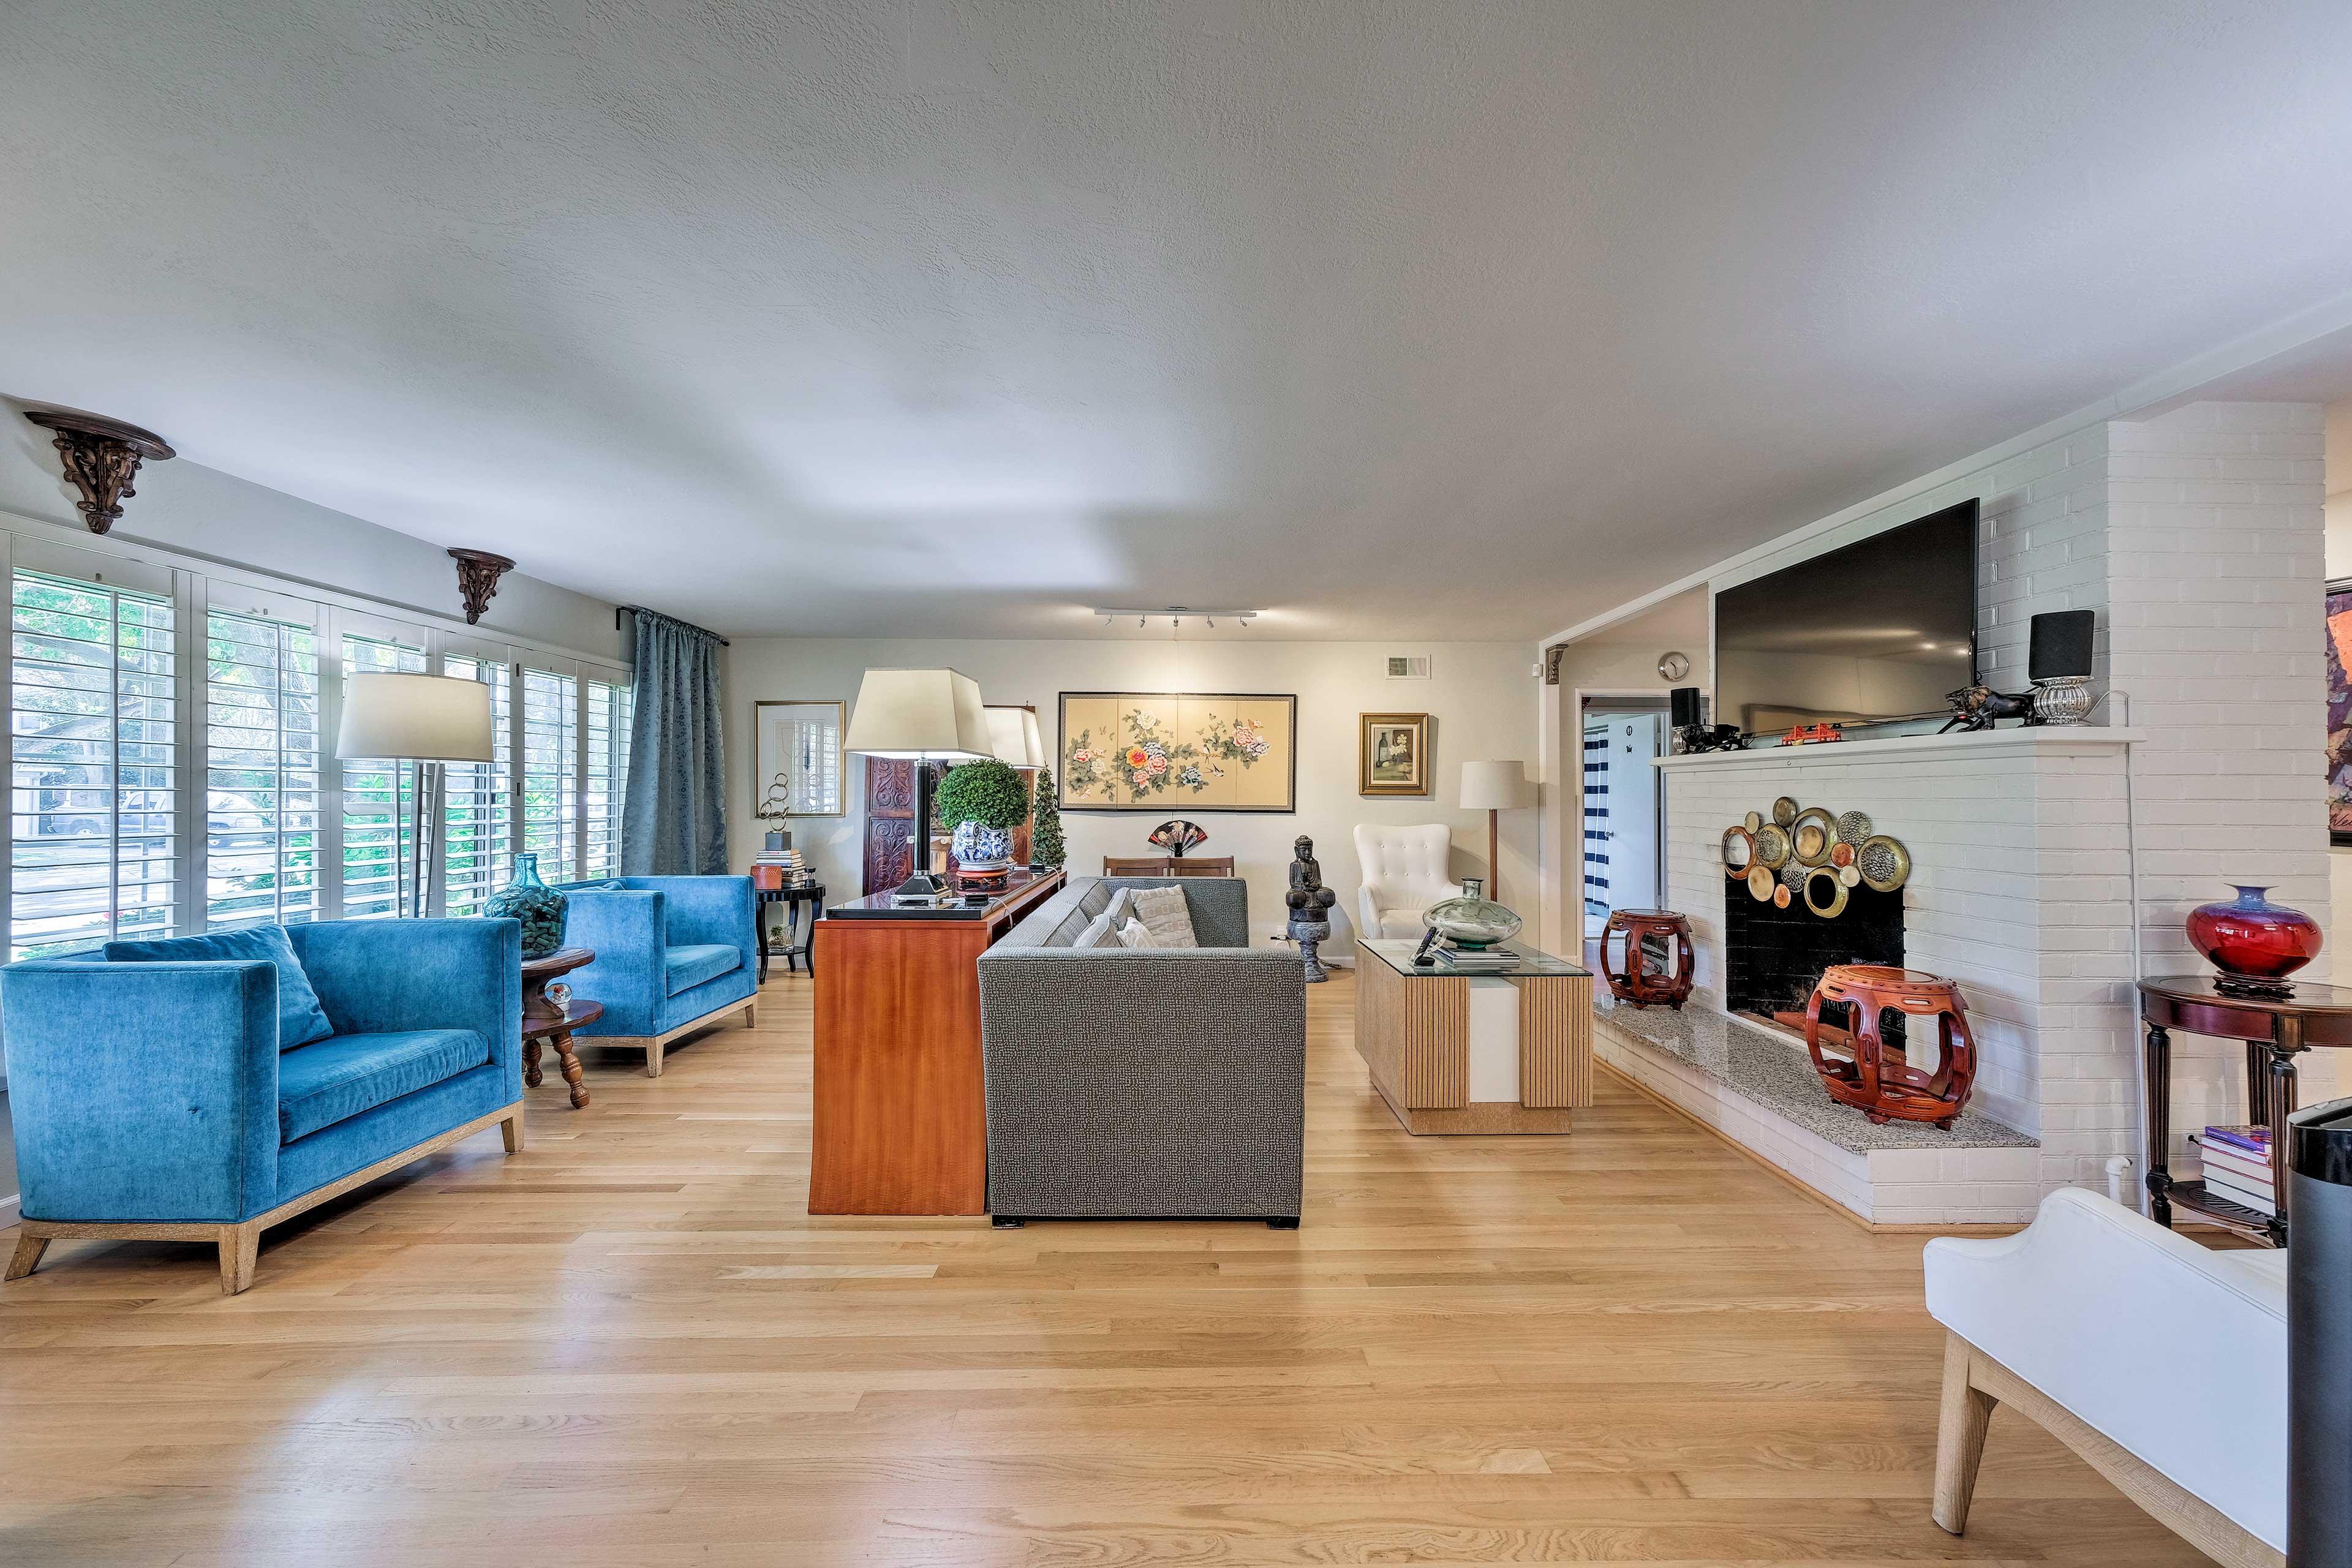 Living Room | 55-Inch 4K Smart TV w/ Roku